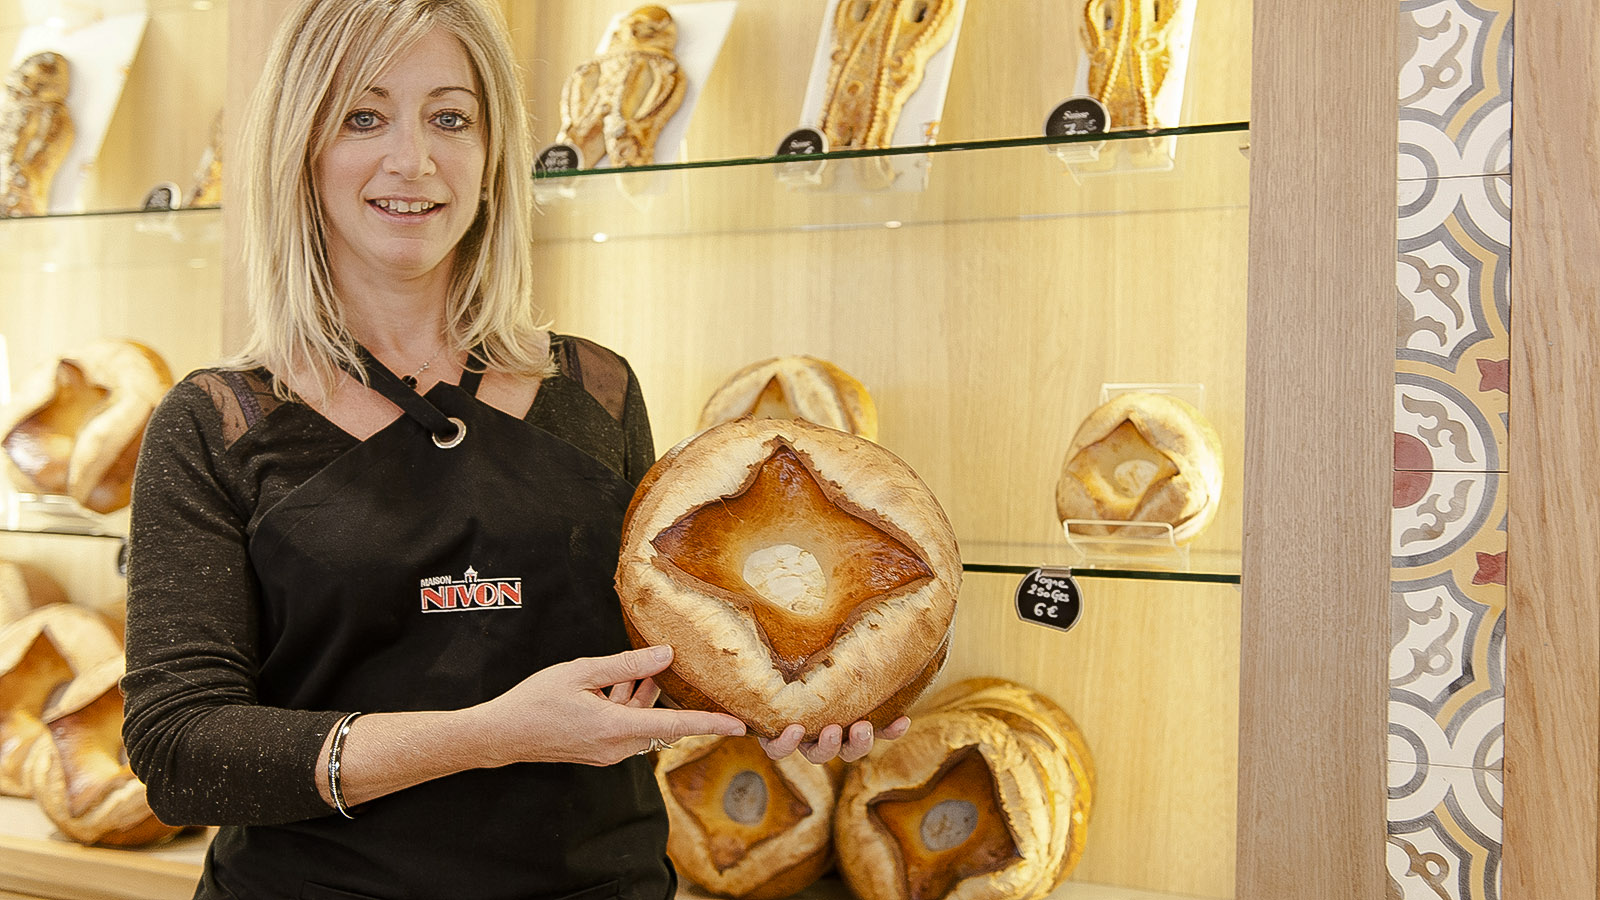 Pogne: Bäckerei Nivon, Valence. Foto: Hilke Maunder